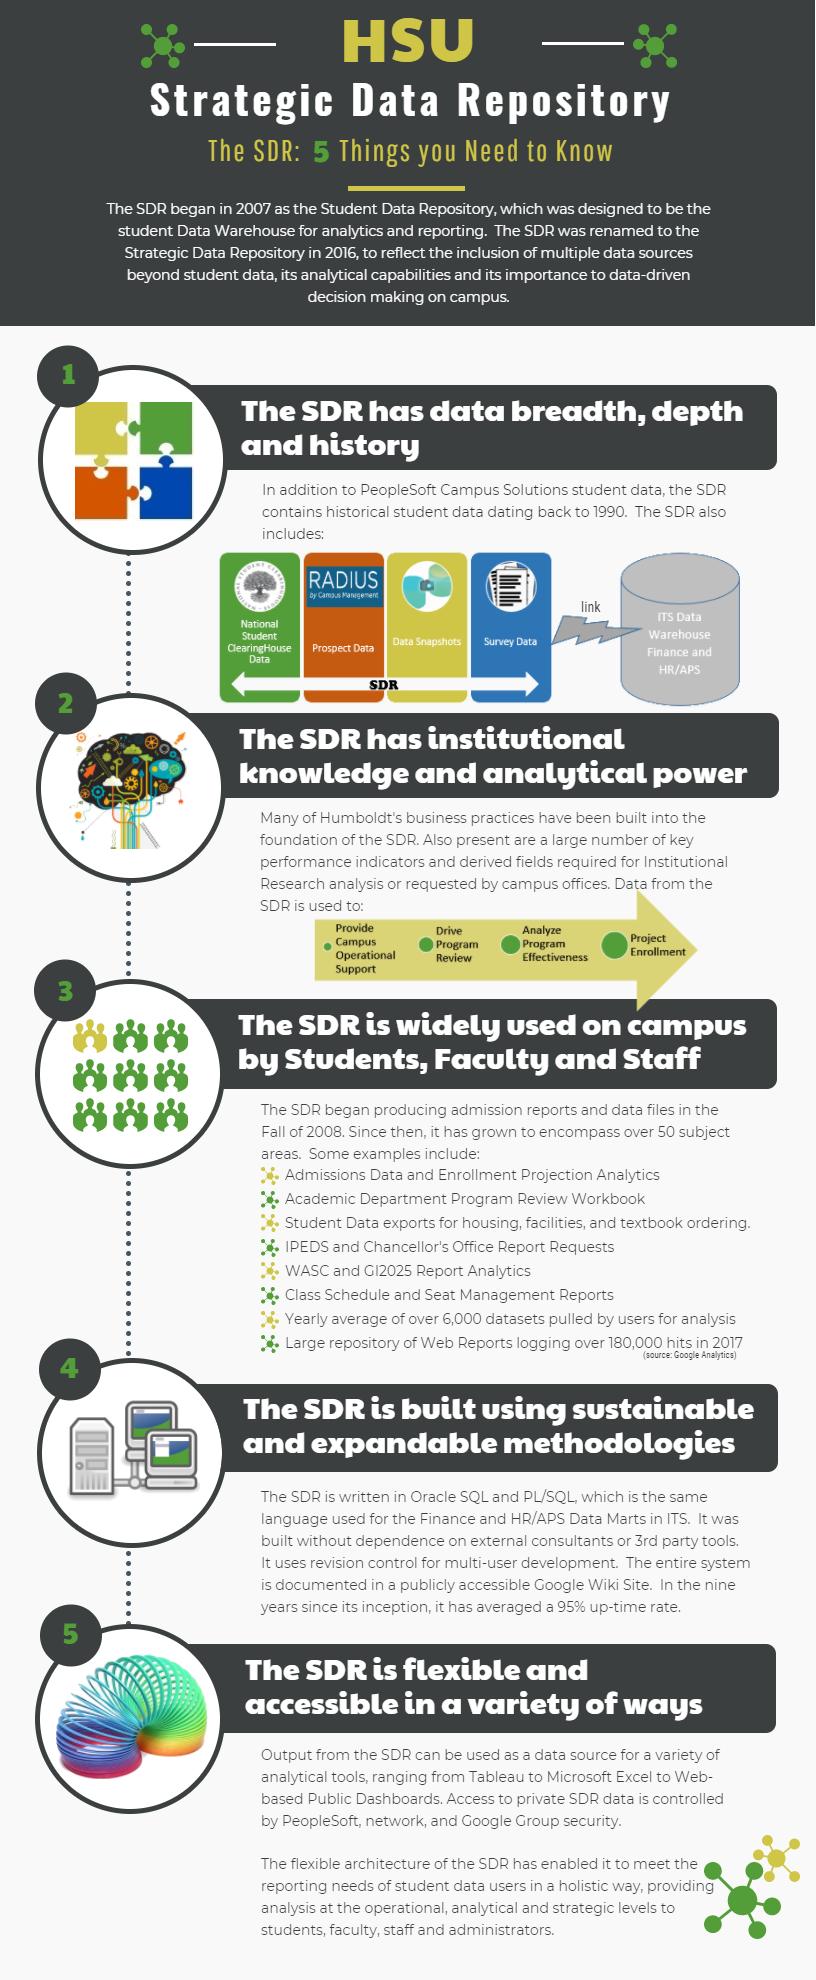 OIE Infographic Image